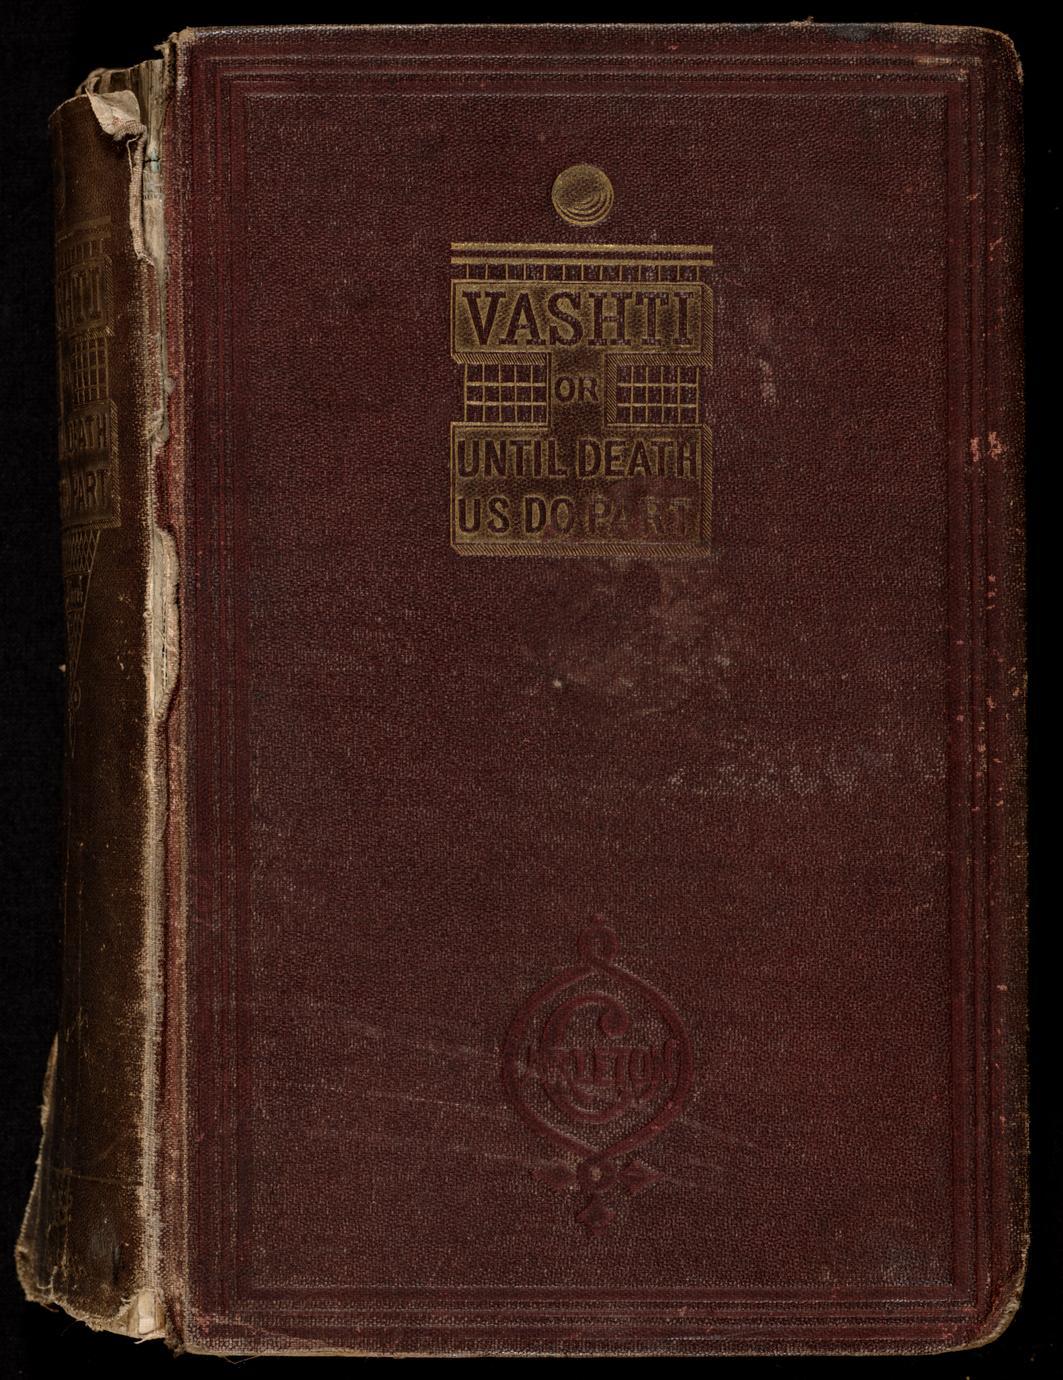 Vashti ; or, Until death do us part : a novel (1 of 2)